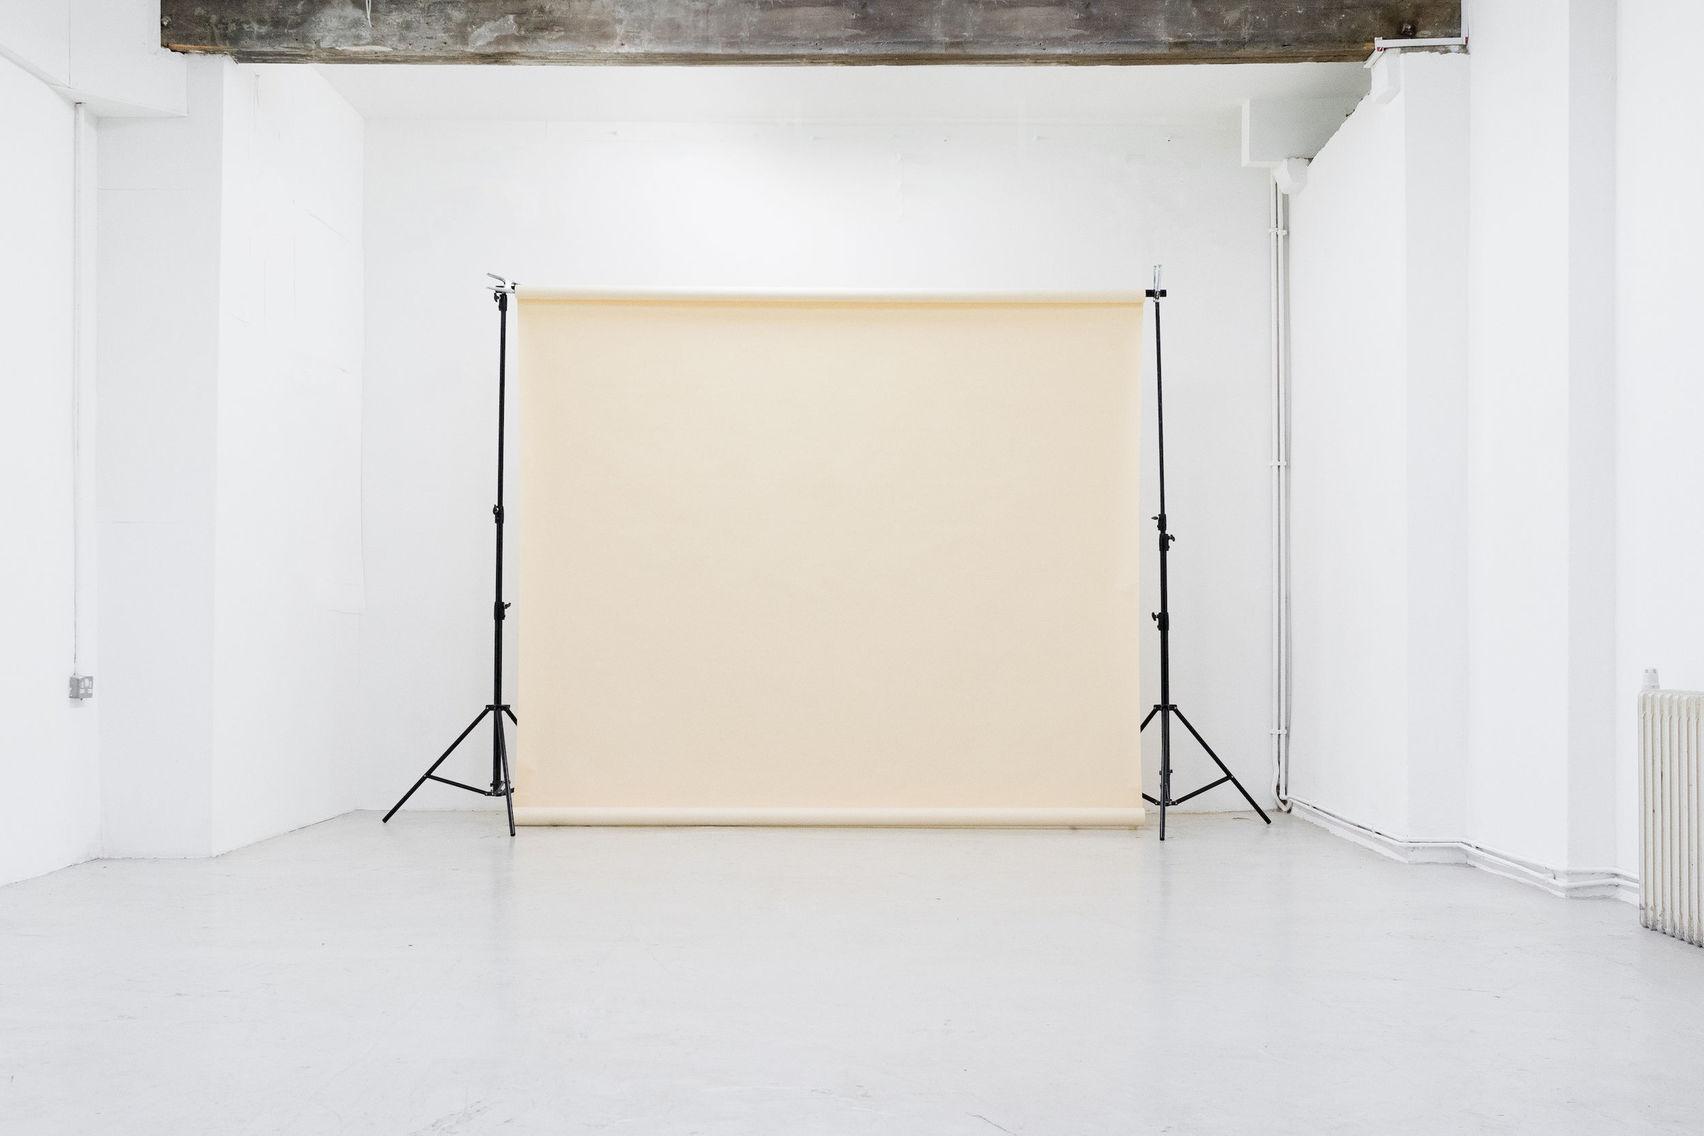 Studio 1, Apiary Studios